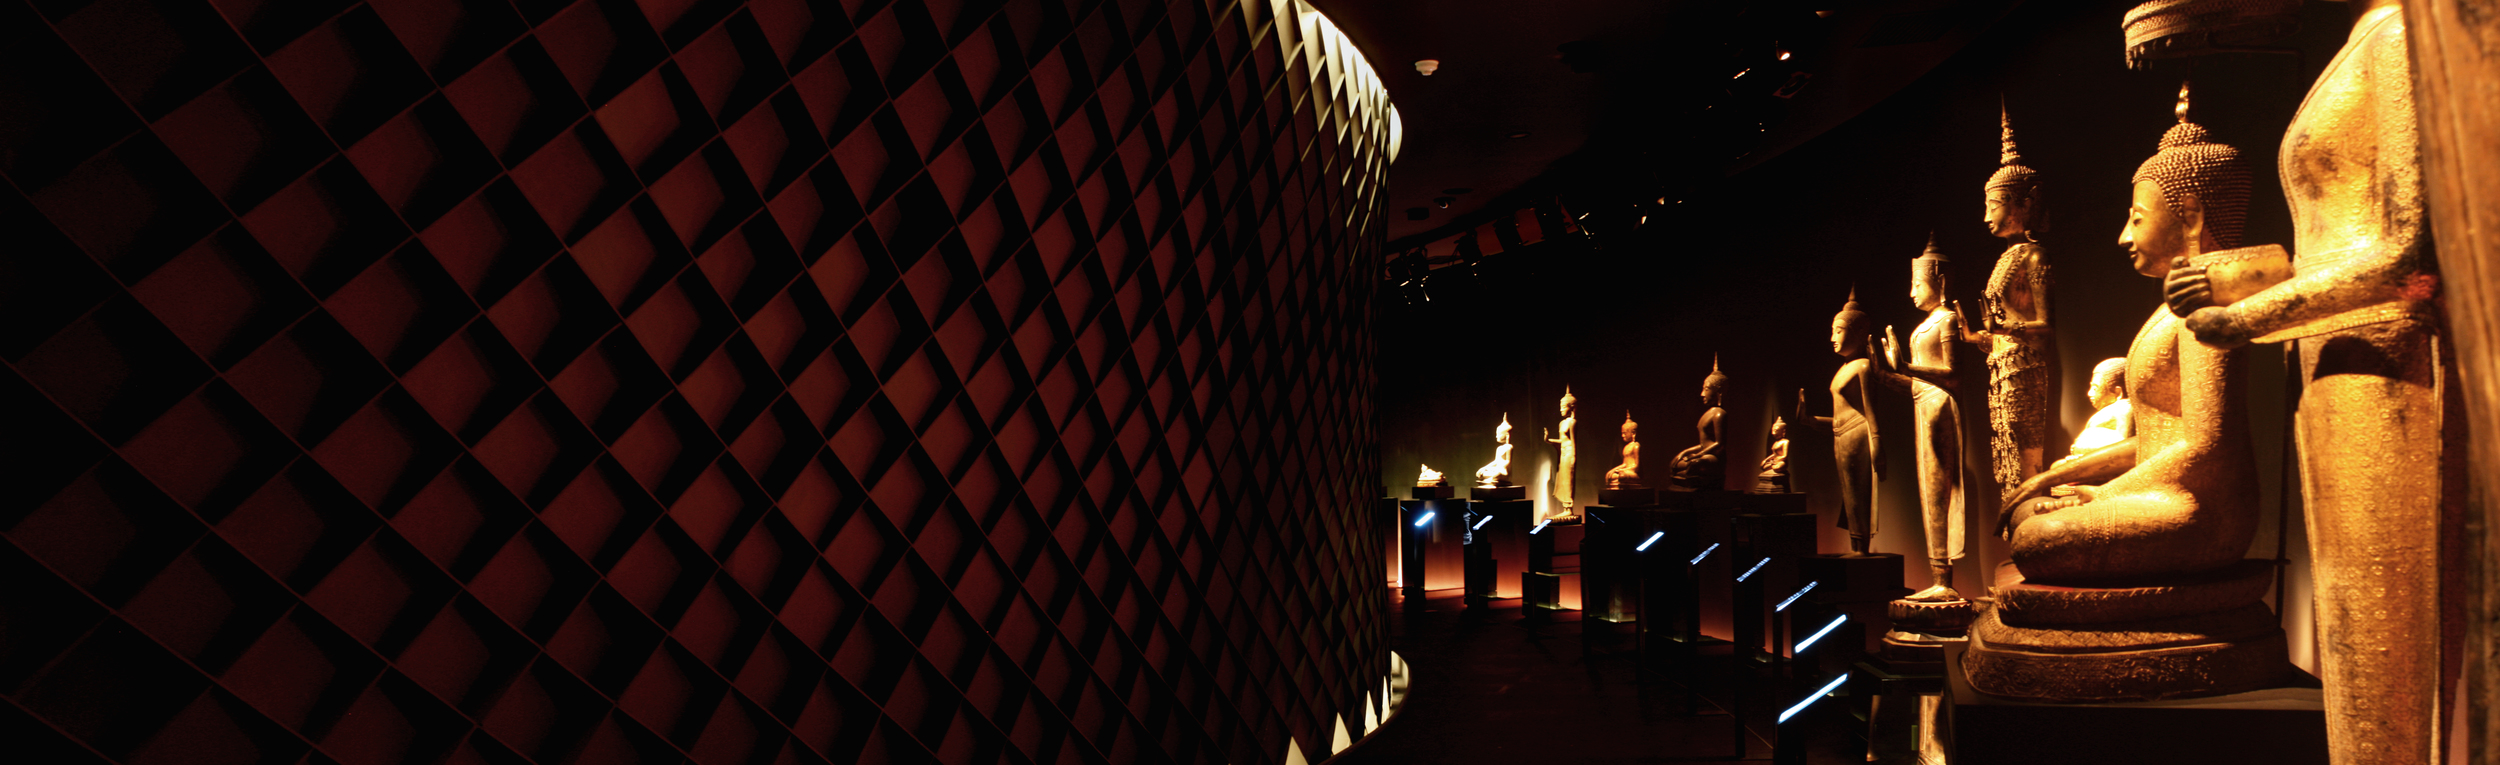 vr interior 2 panorama.jpg